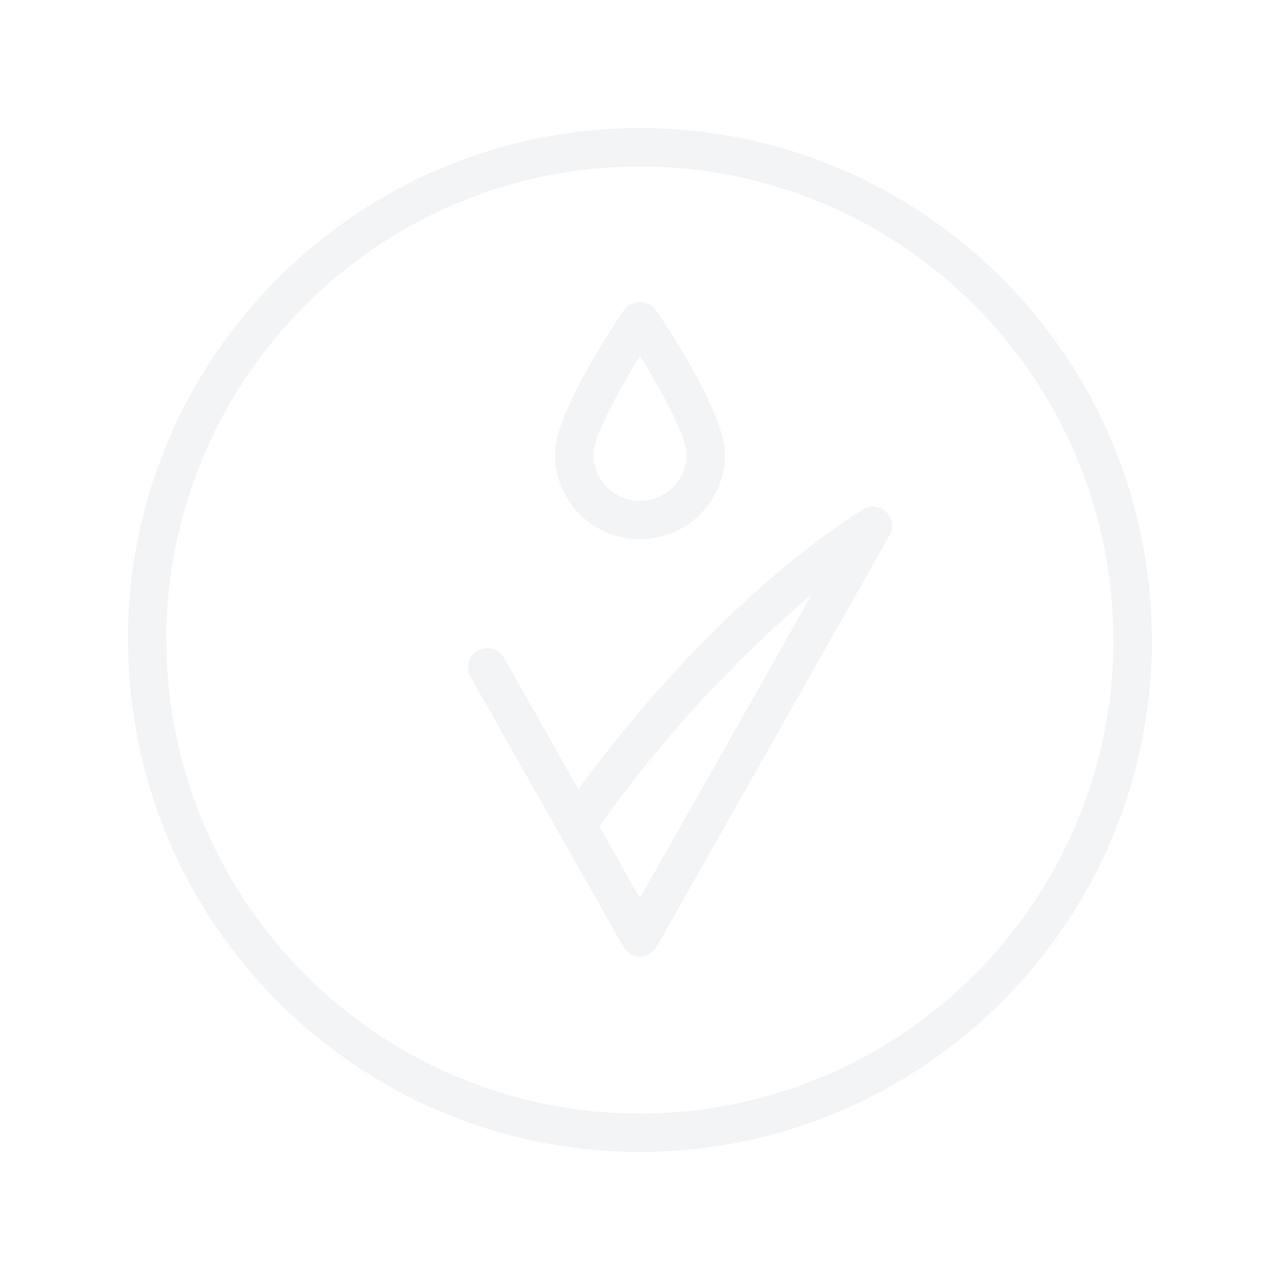 LUUV Natural Self Tanning Dry Oil Dark 100ml